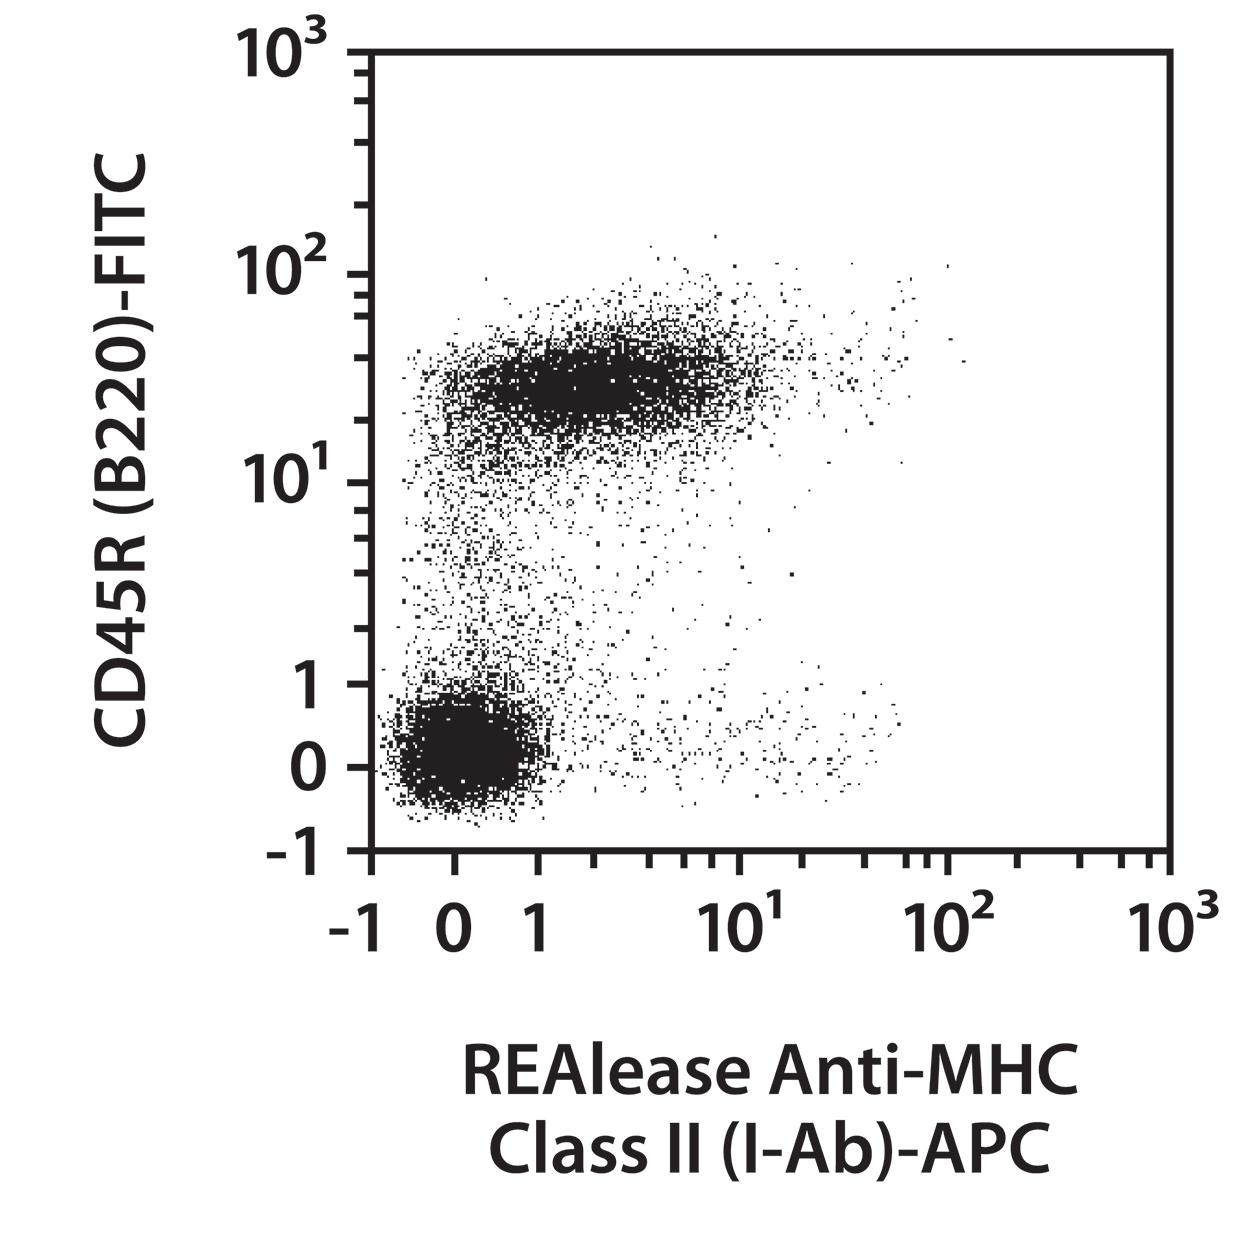 MHC Class II (I-Ab) Antibody, anti-mouse, REAlease®